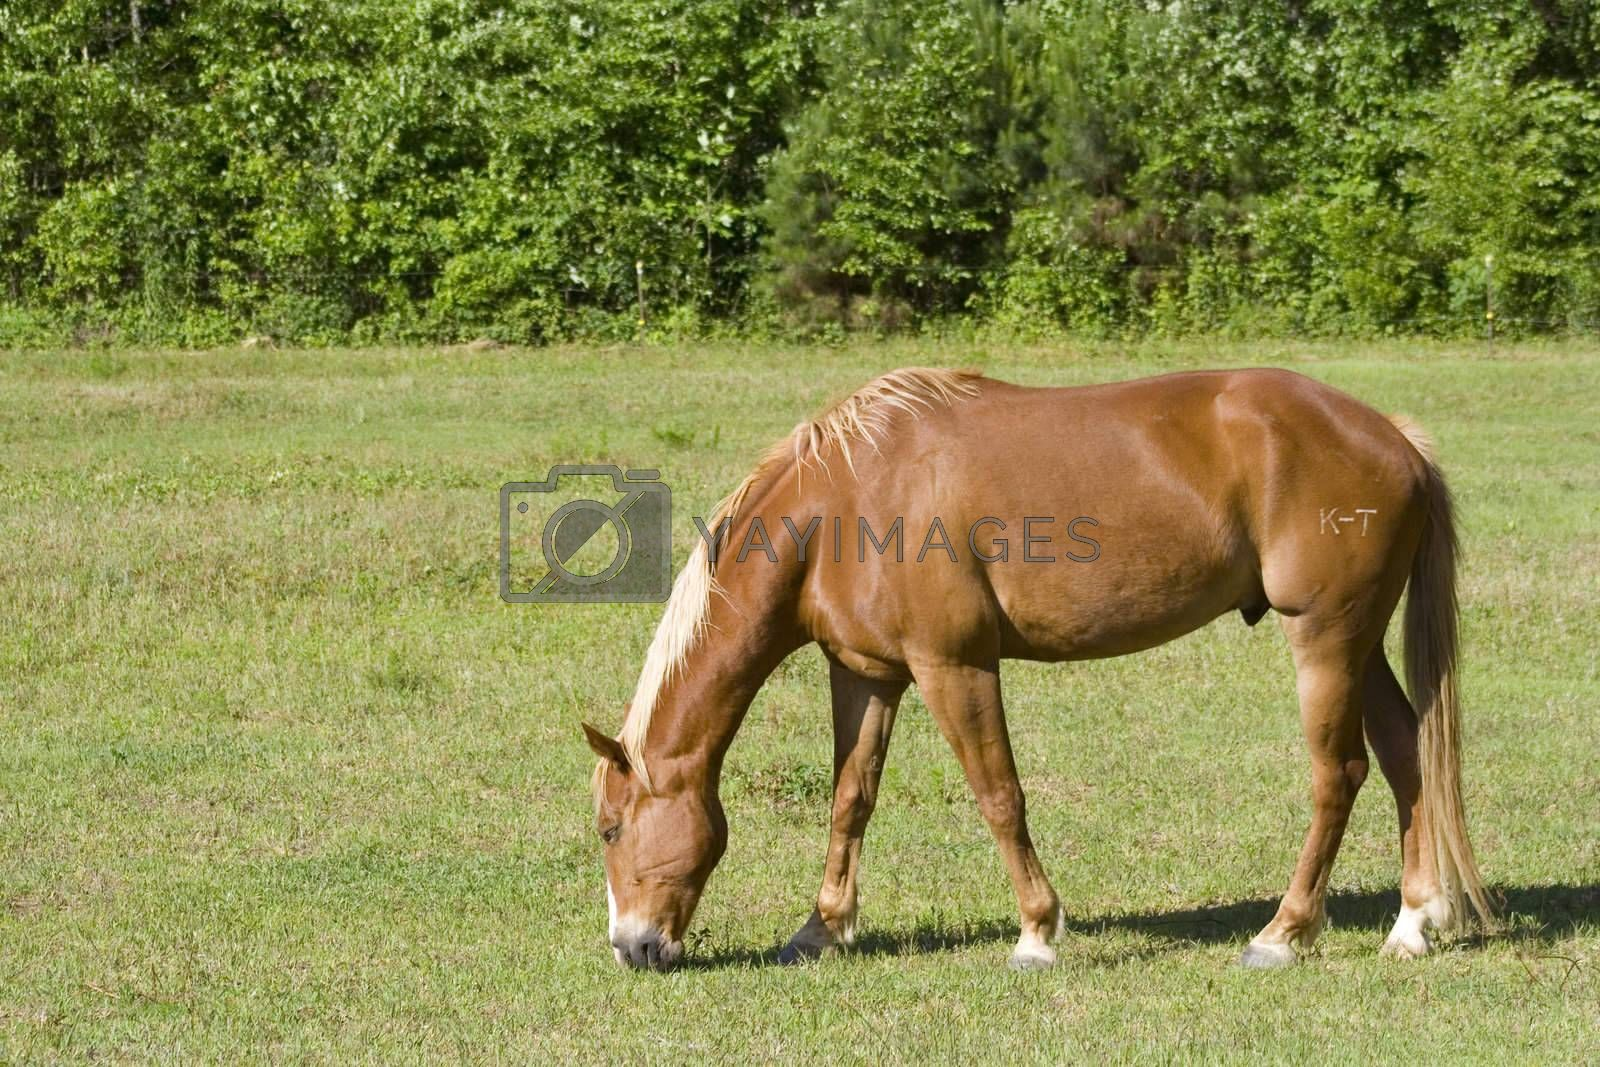 Horse Grazing by jclardy